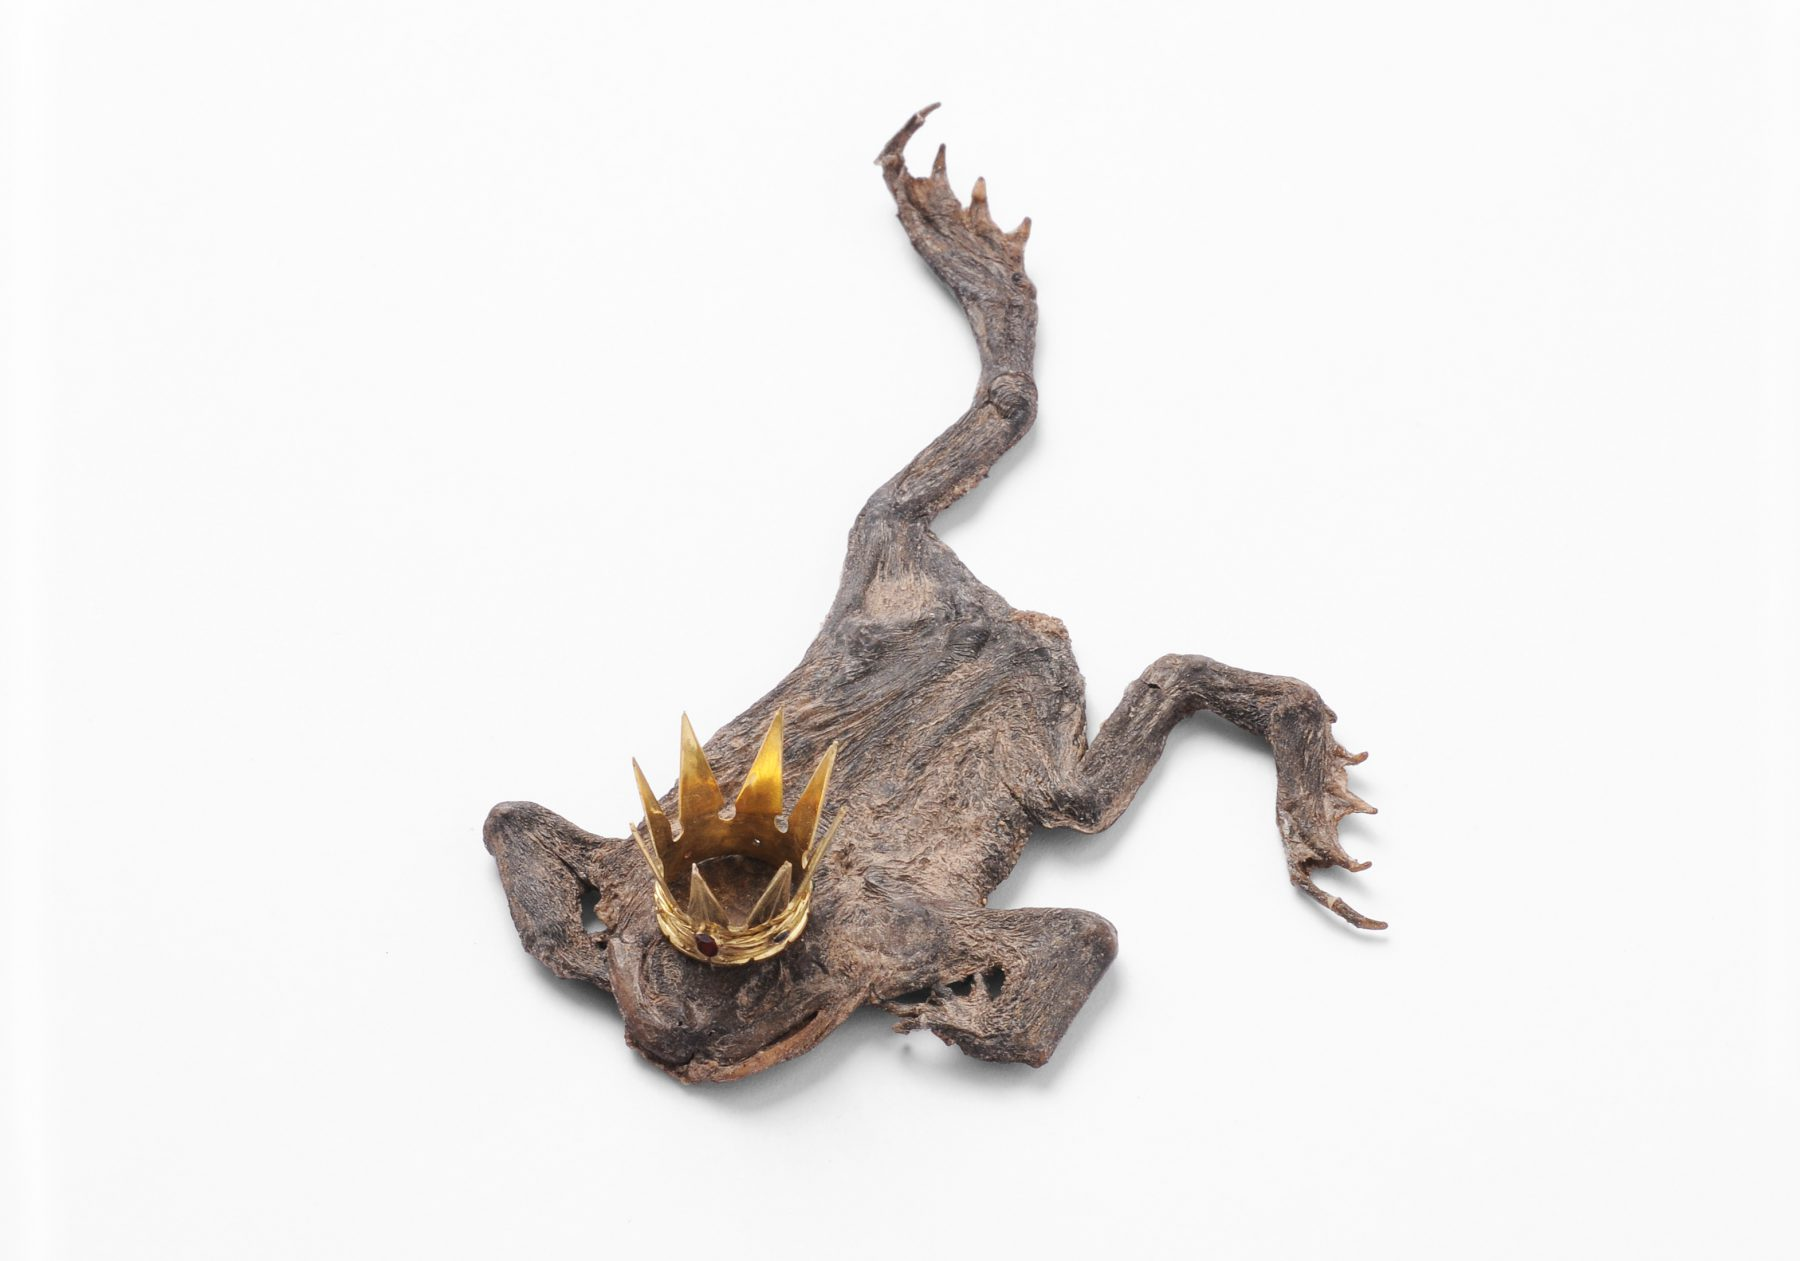 """The True Story of Prince Frog""    |   Pendant    |   2012 |      Frog, gold, diamond, saphir, granat  |    85X70X35 mm"